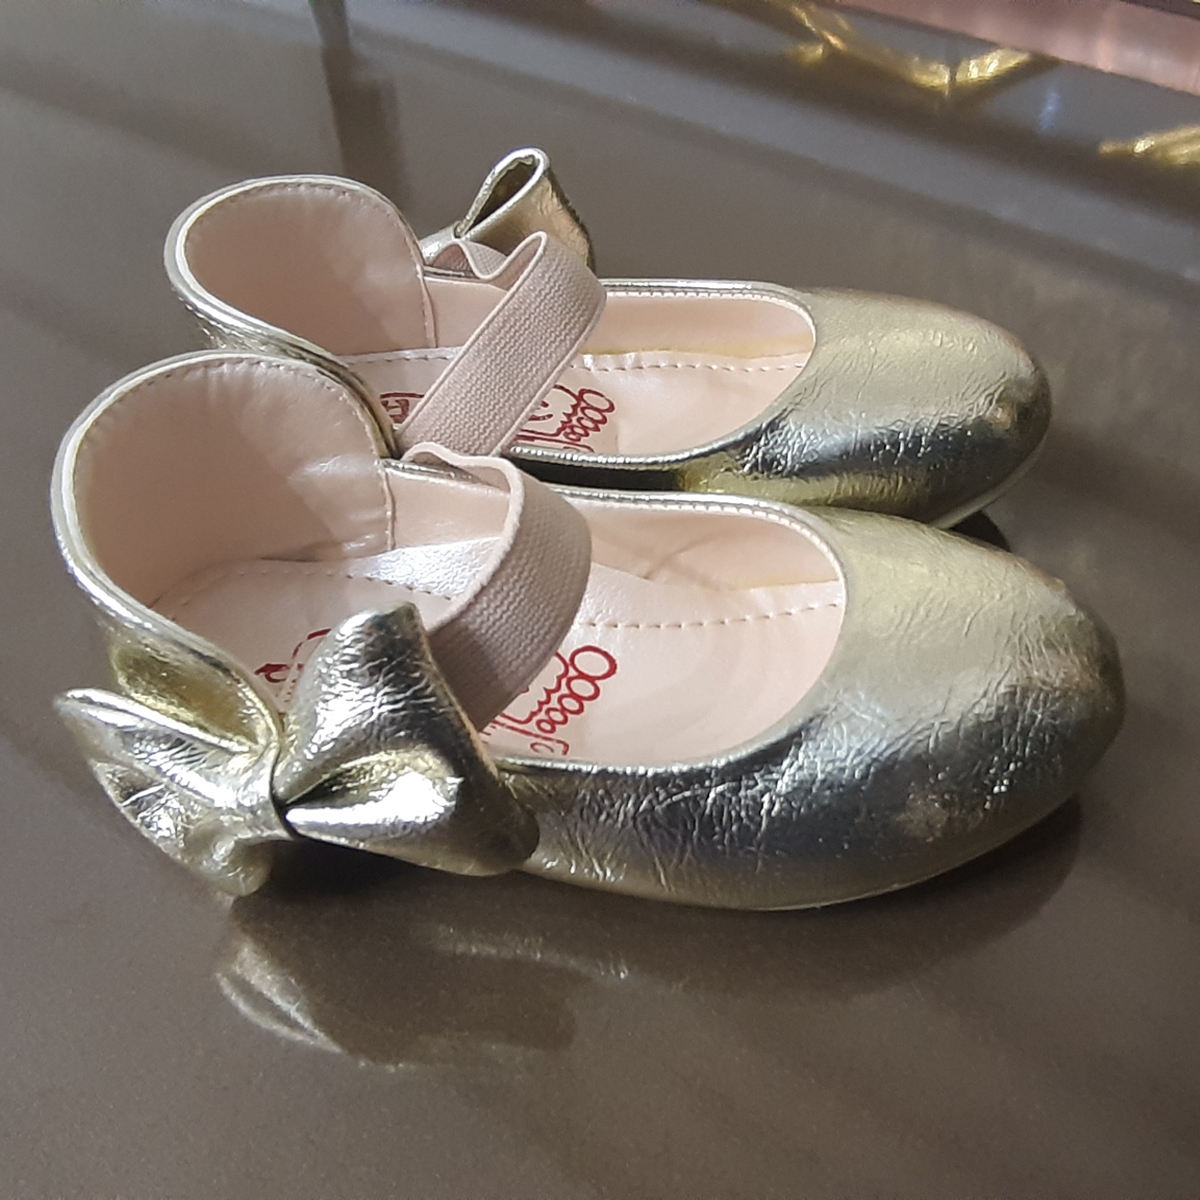 کفش دخترانه طرح پاپیون مدل 78041 -  - 4